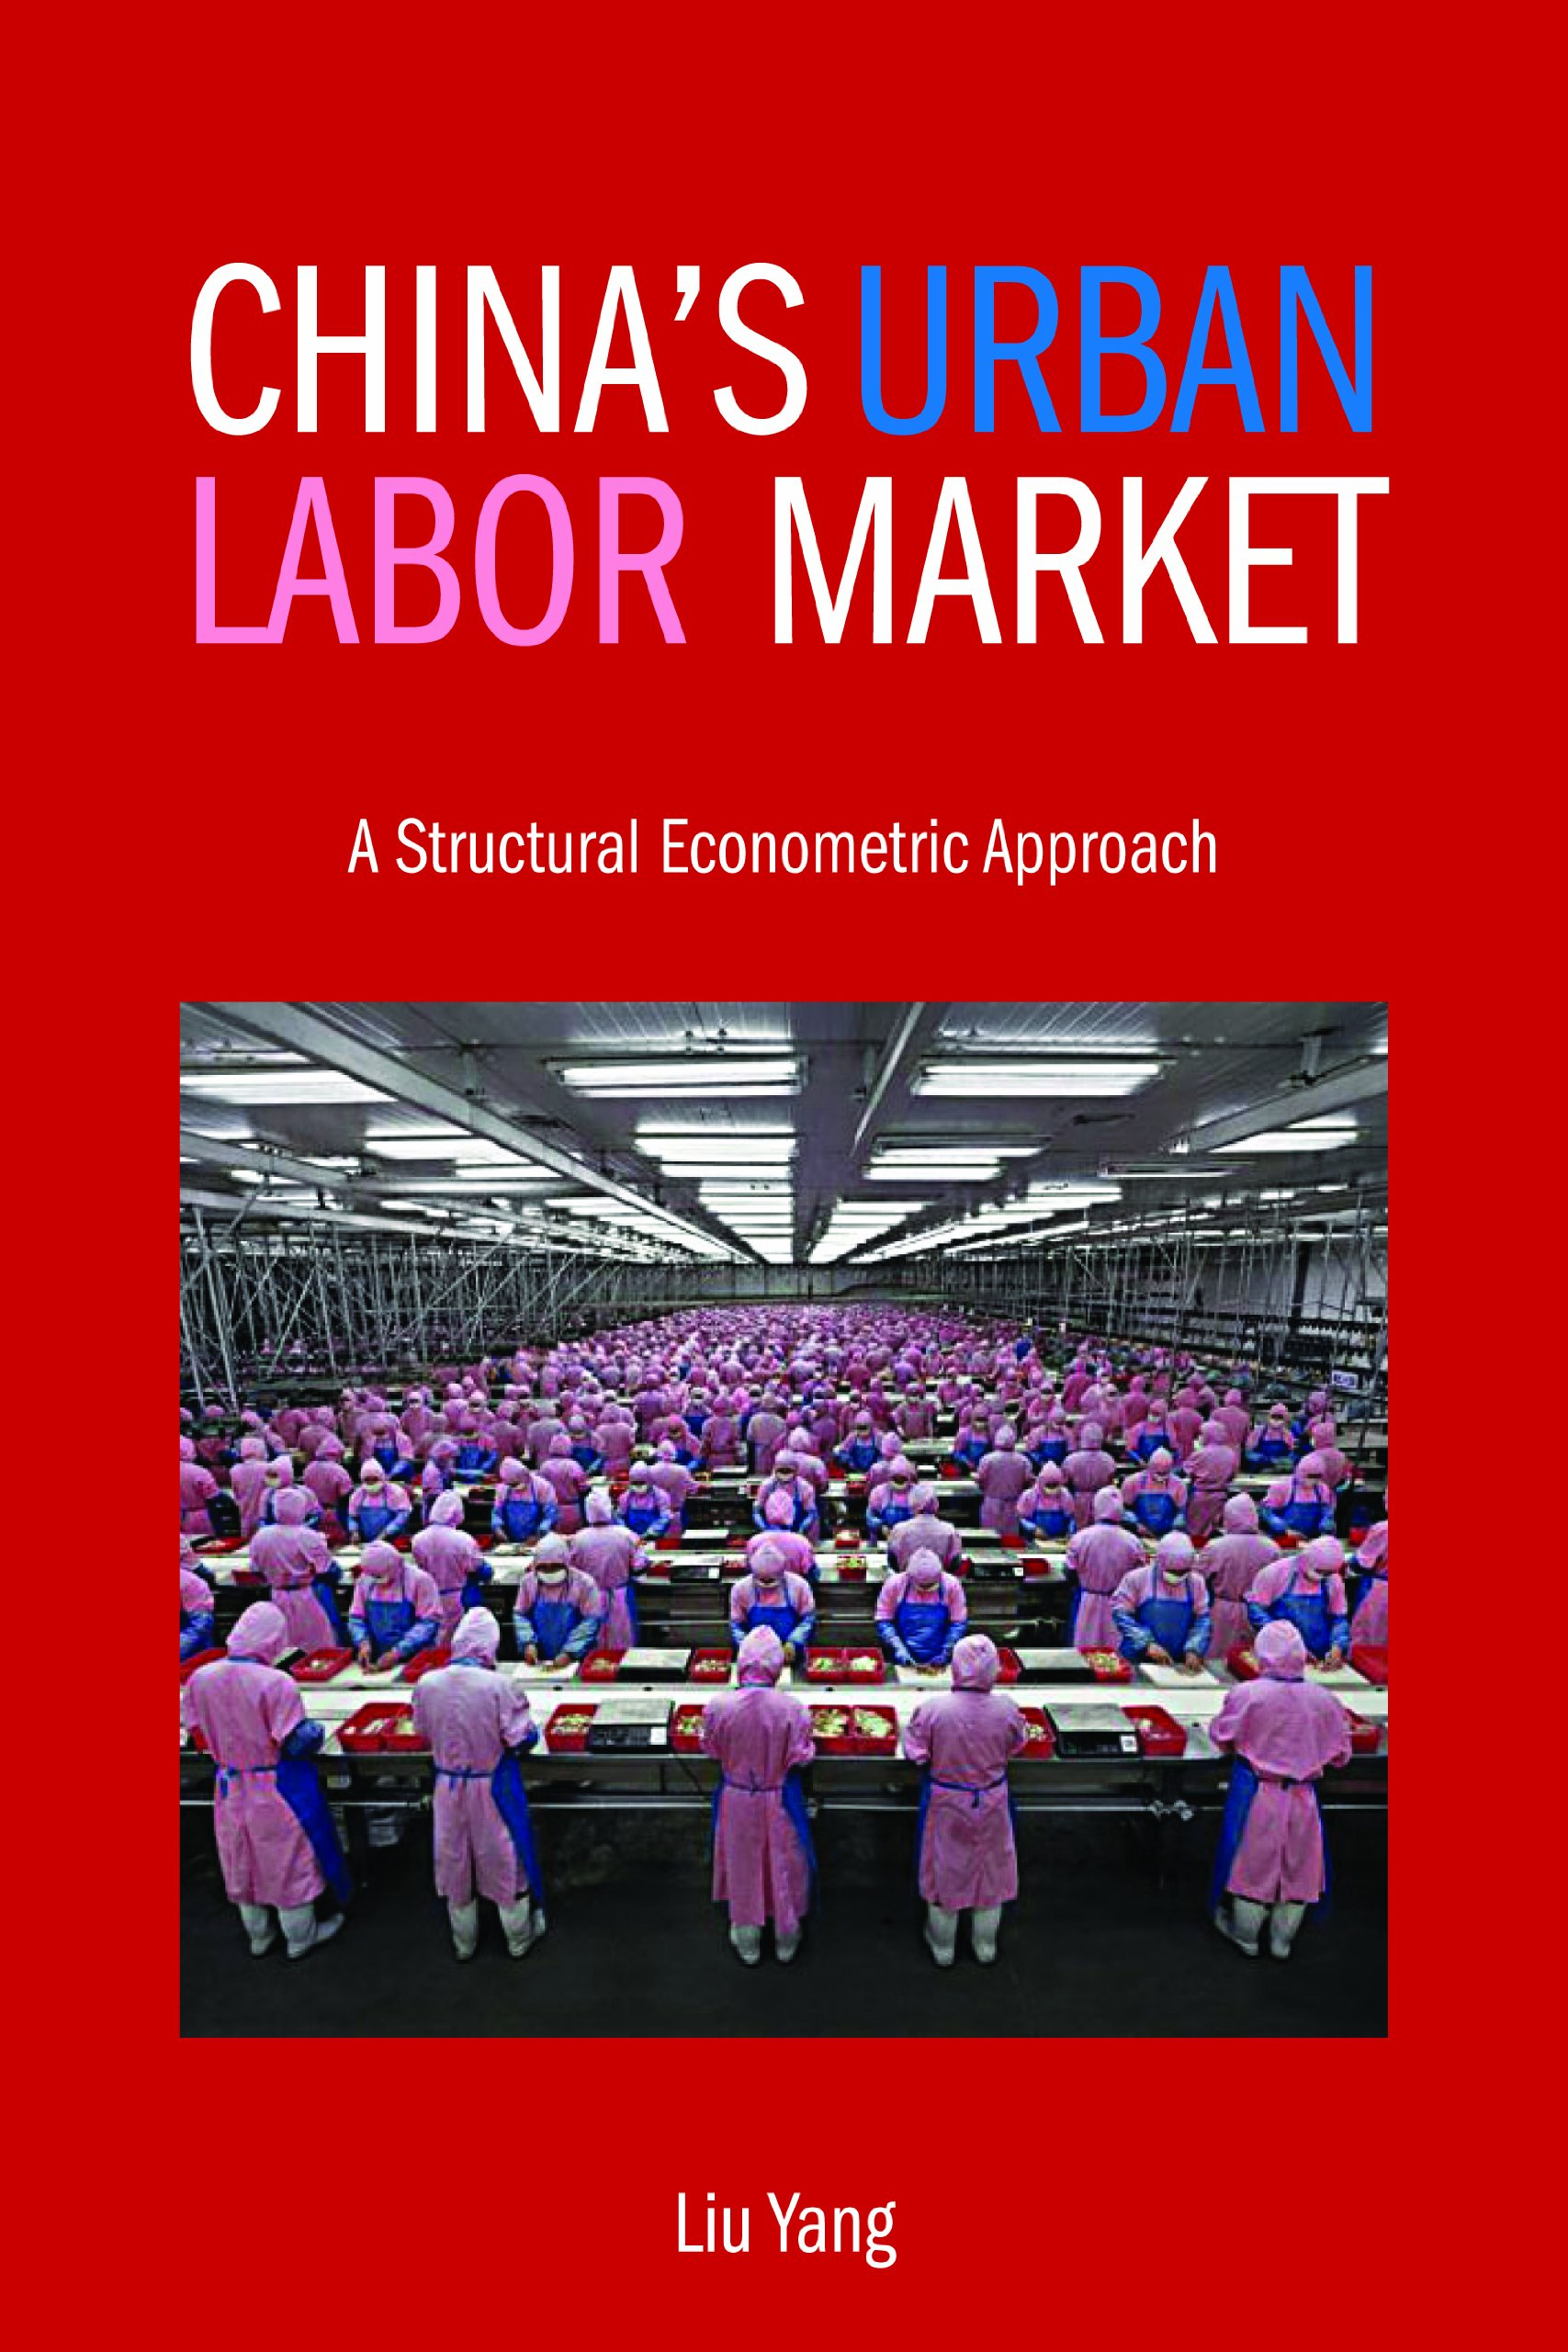 China's Urban Labor Market: A Structural Econometric Approach pdf